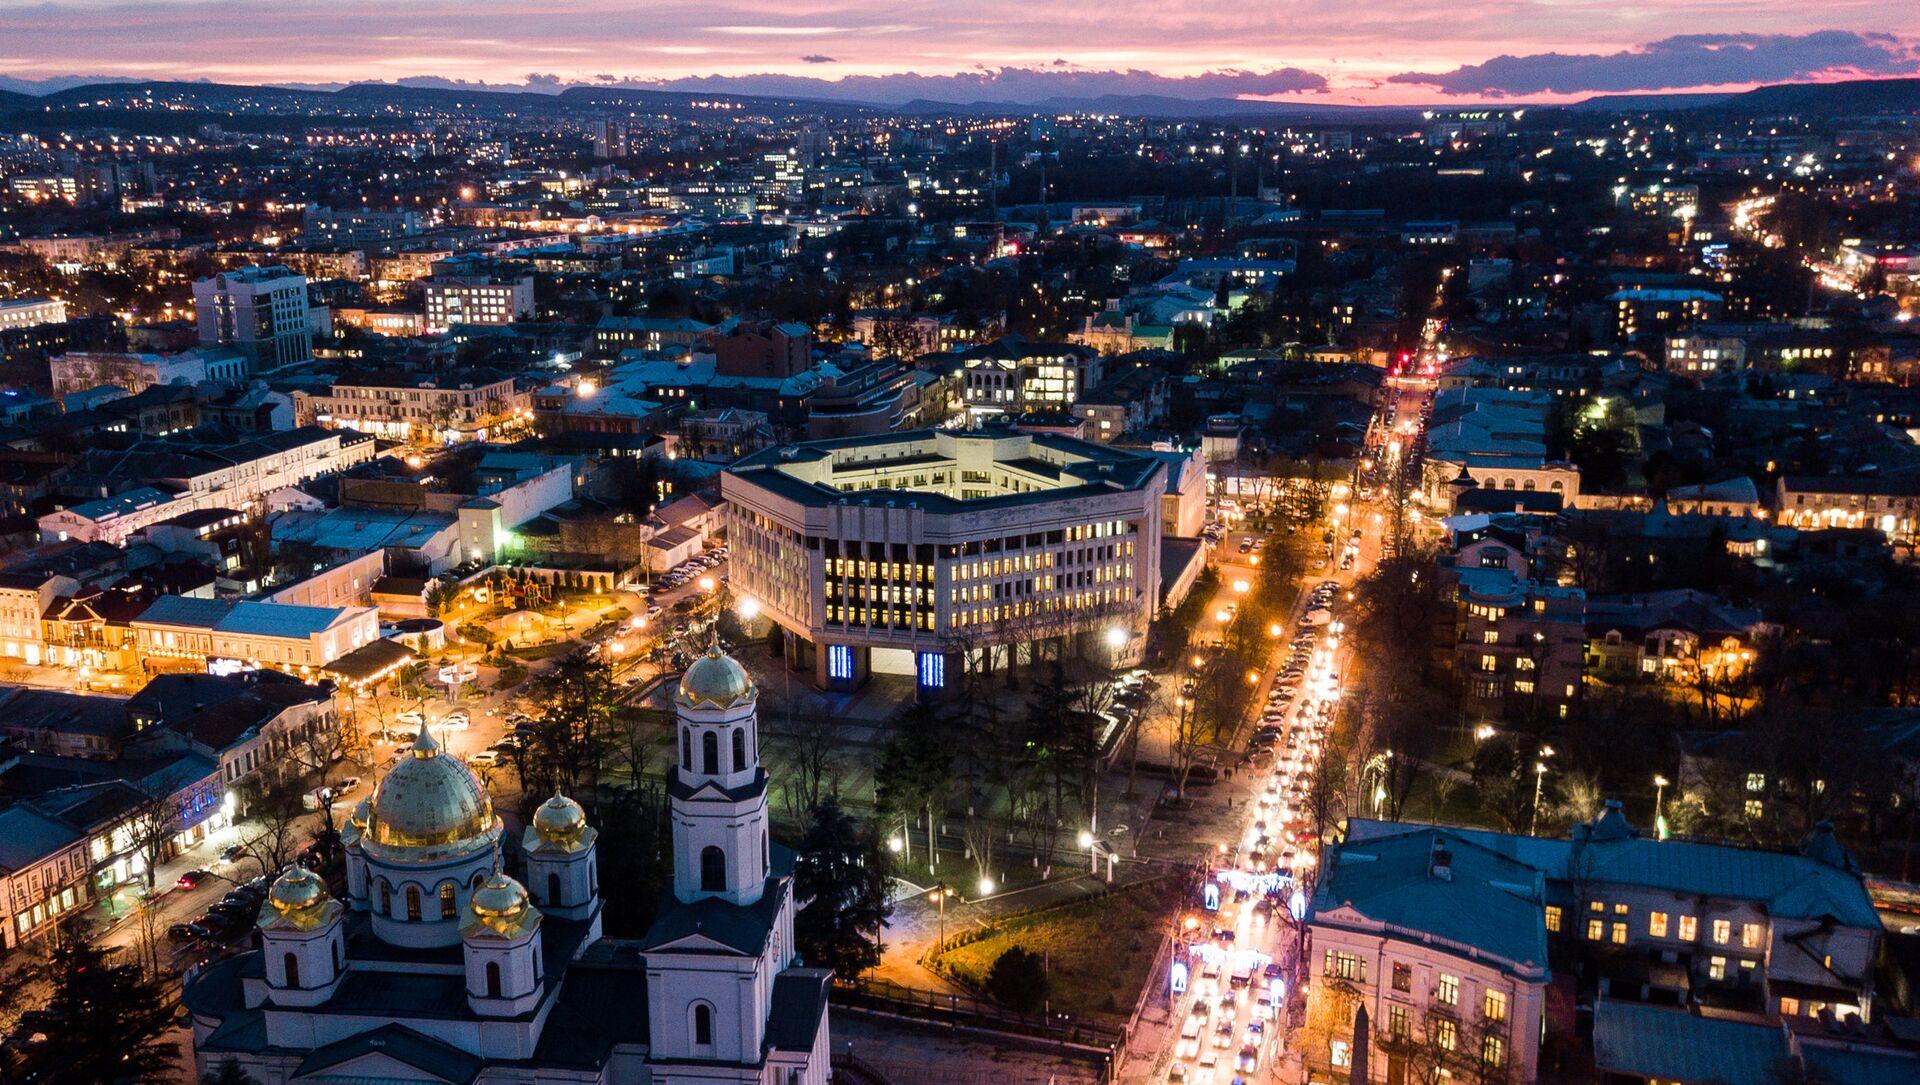 La ciudad rusa de Simferópol en Crimea (imagen referencial) - Sputnik Mundo, 1920, 02.02.2021